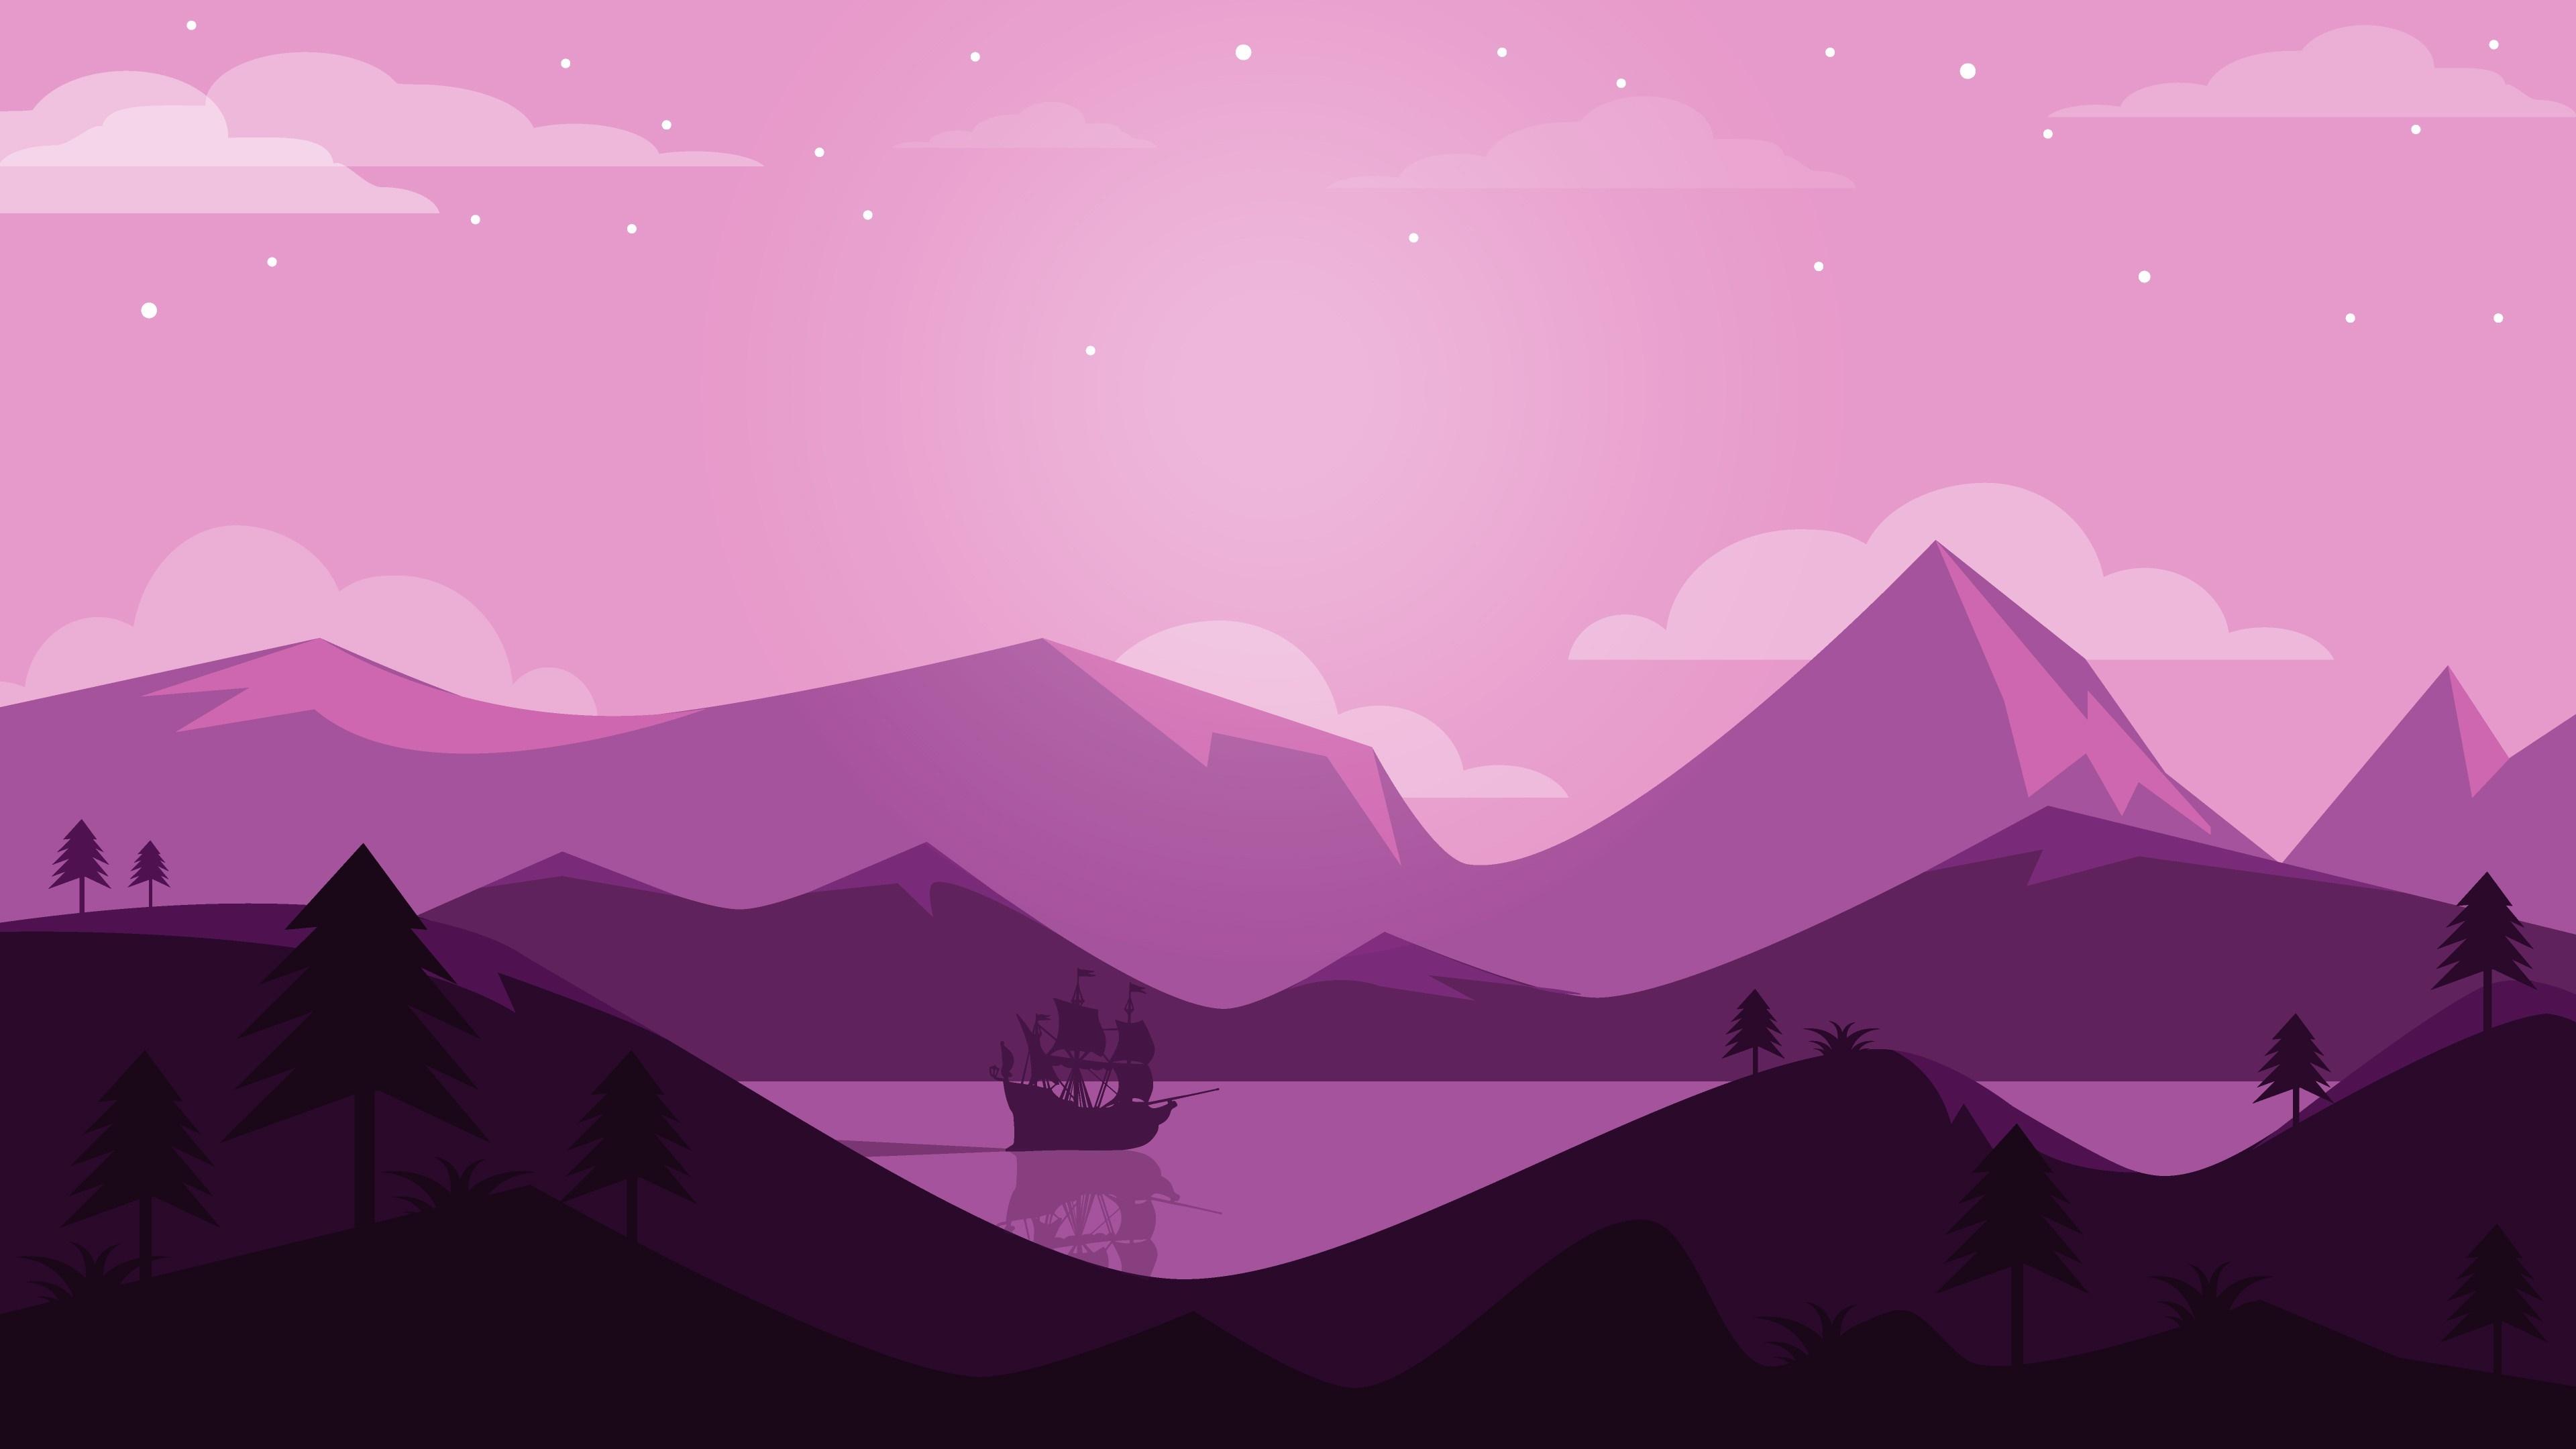 Minimalist landscape illustration wallpaper